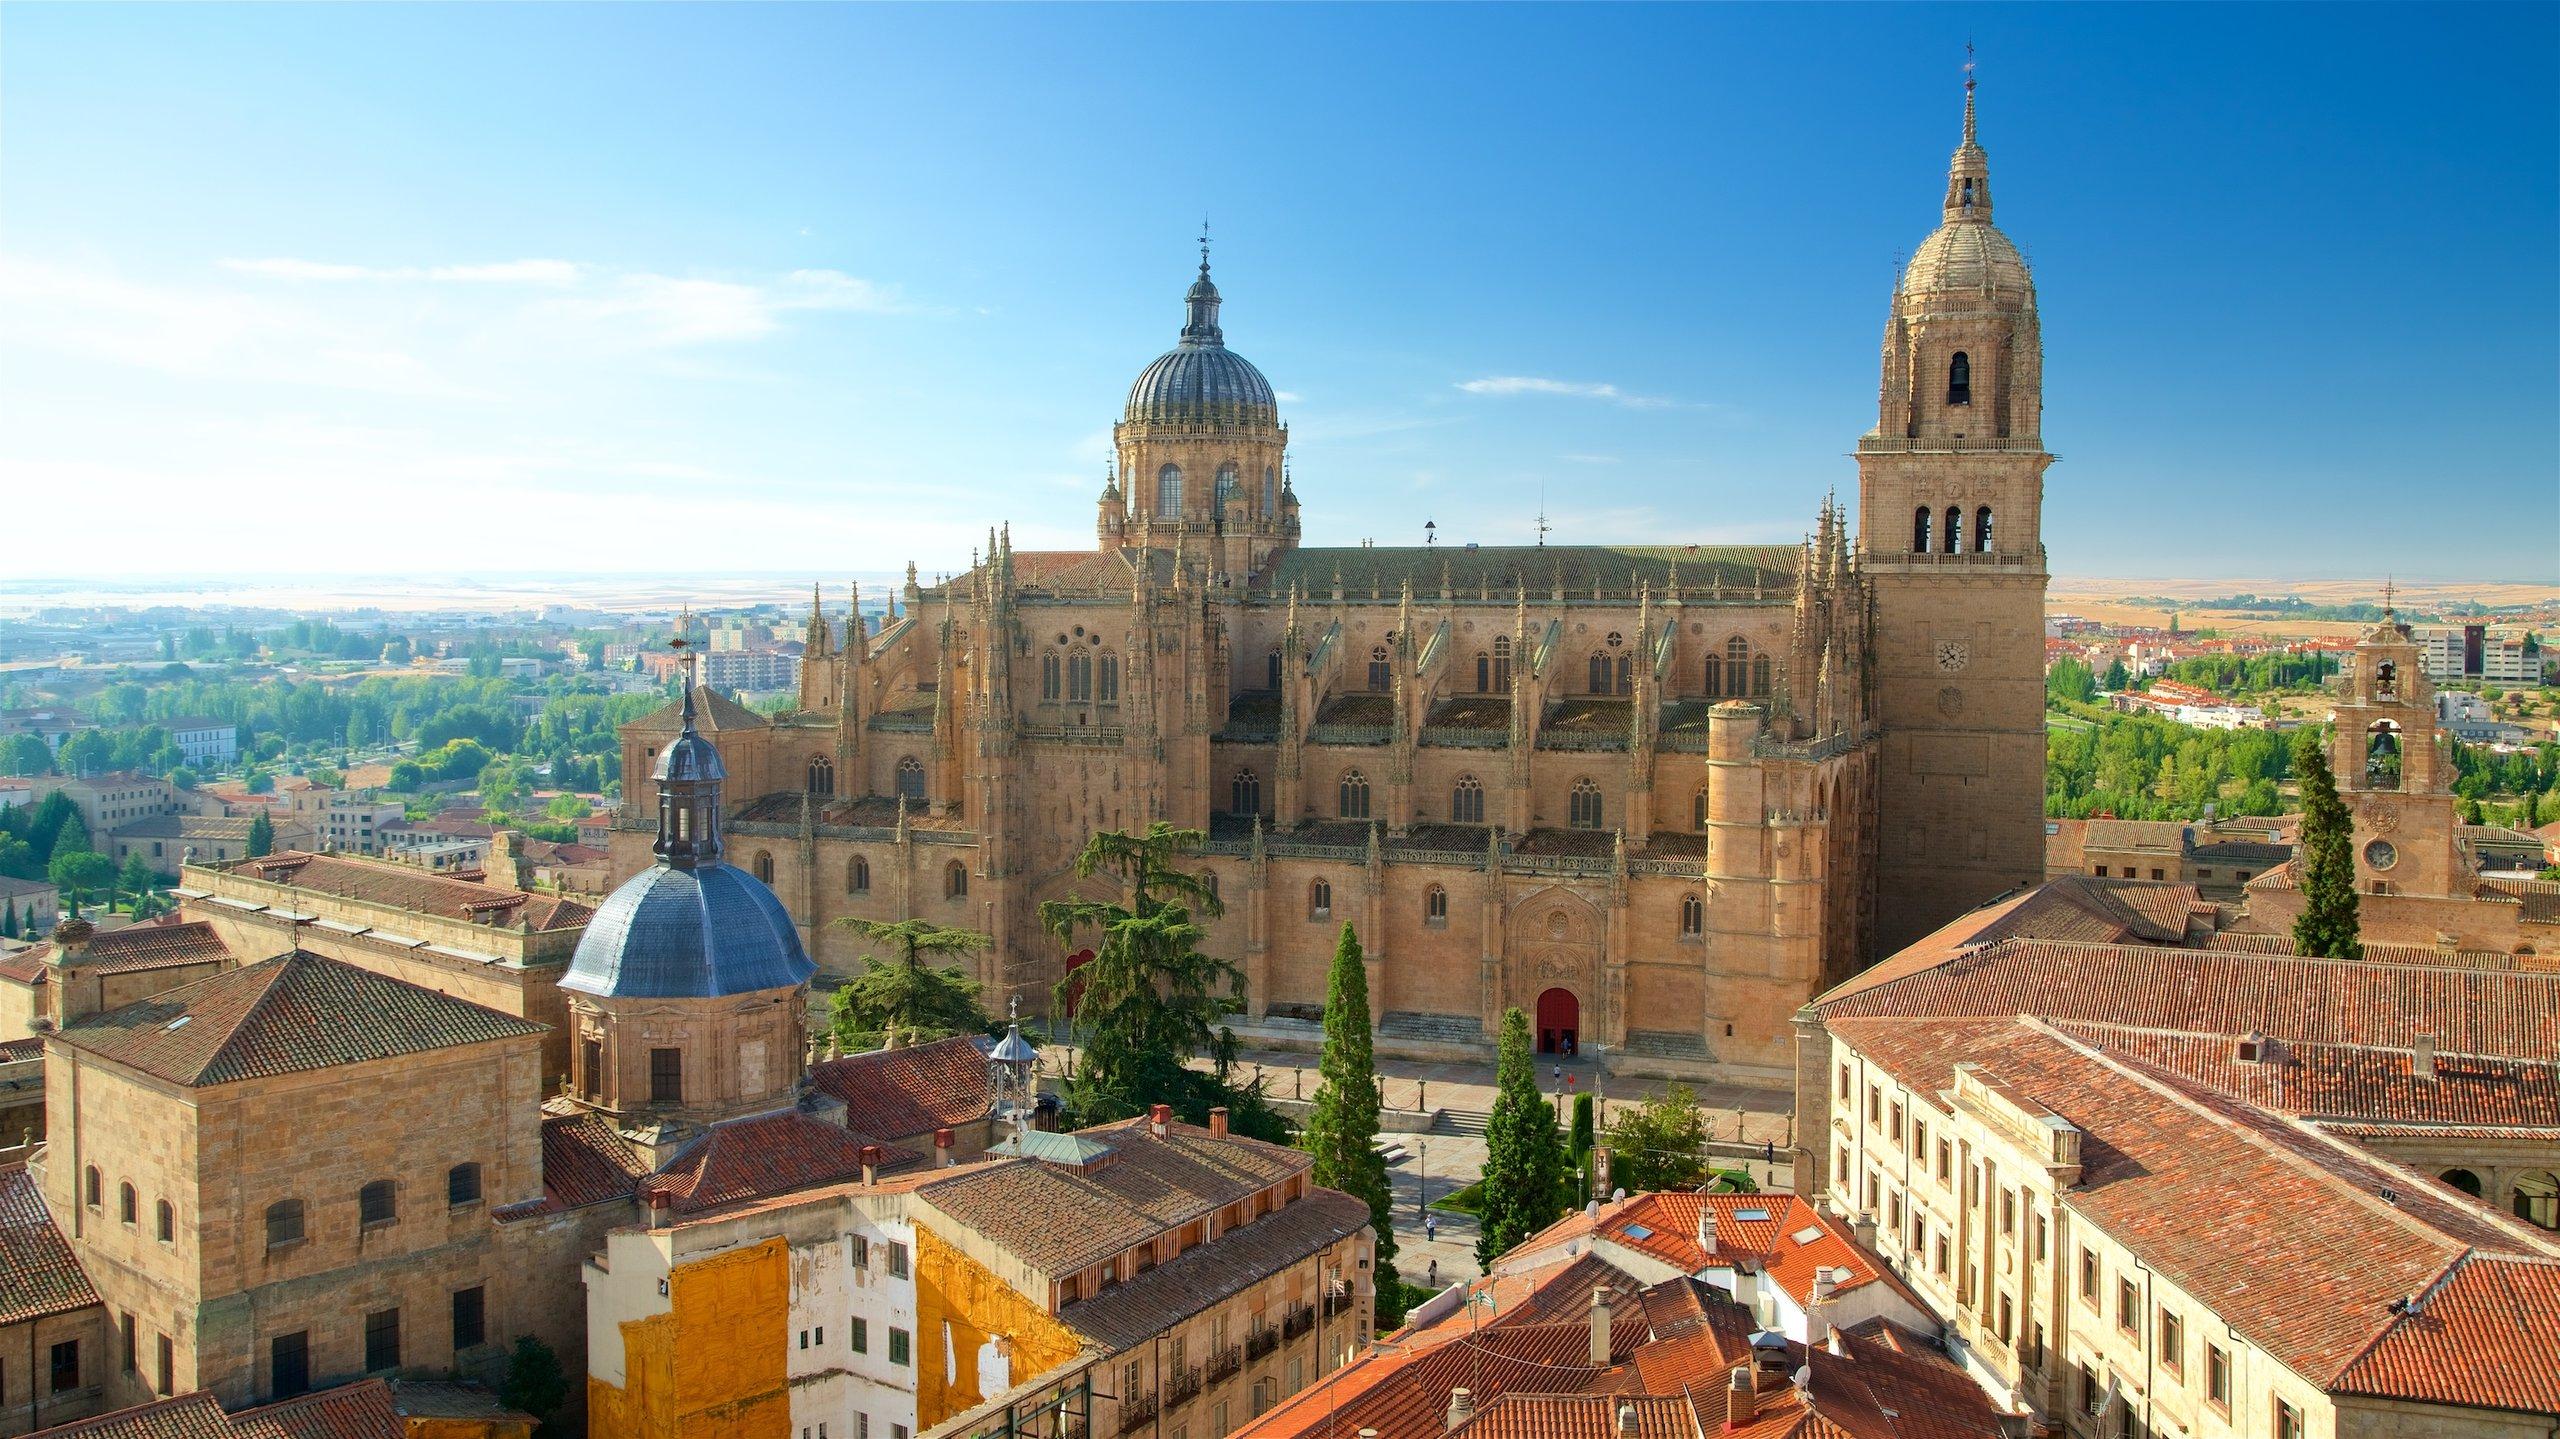 Ciudad vieja de Salamanca, Salamanca, Kastilien und León, Spanien